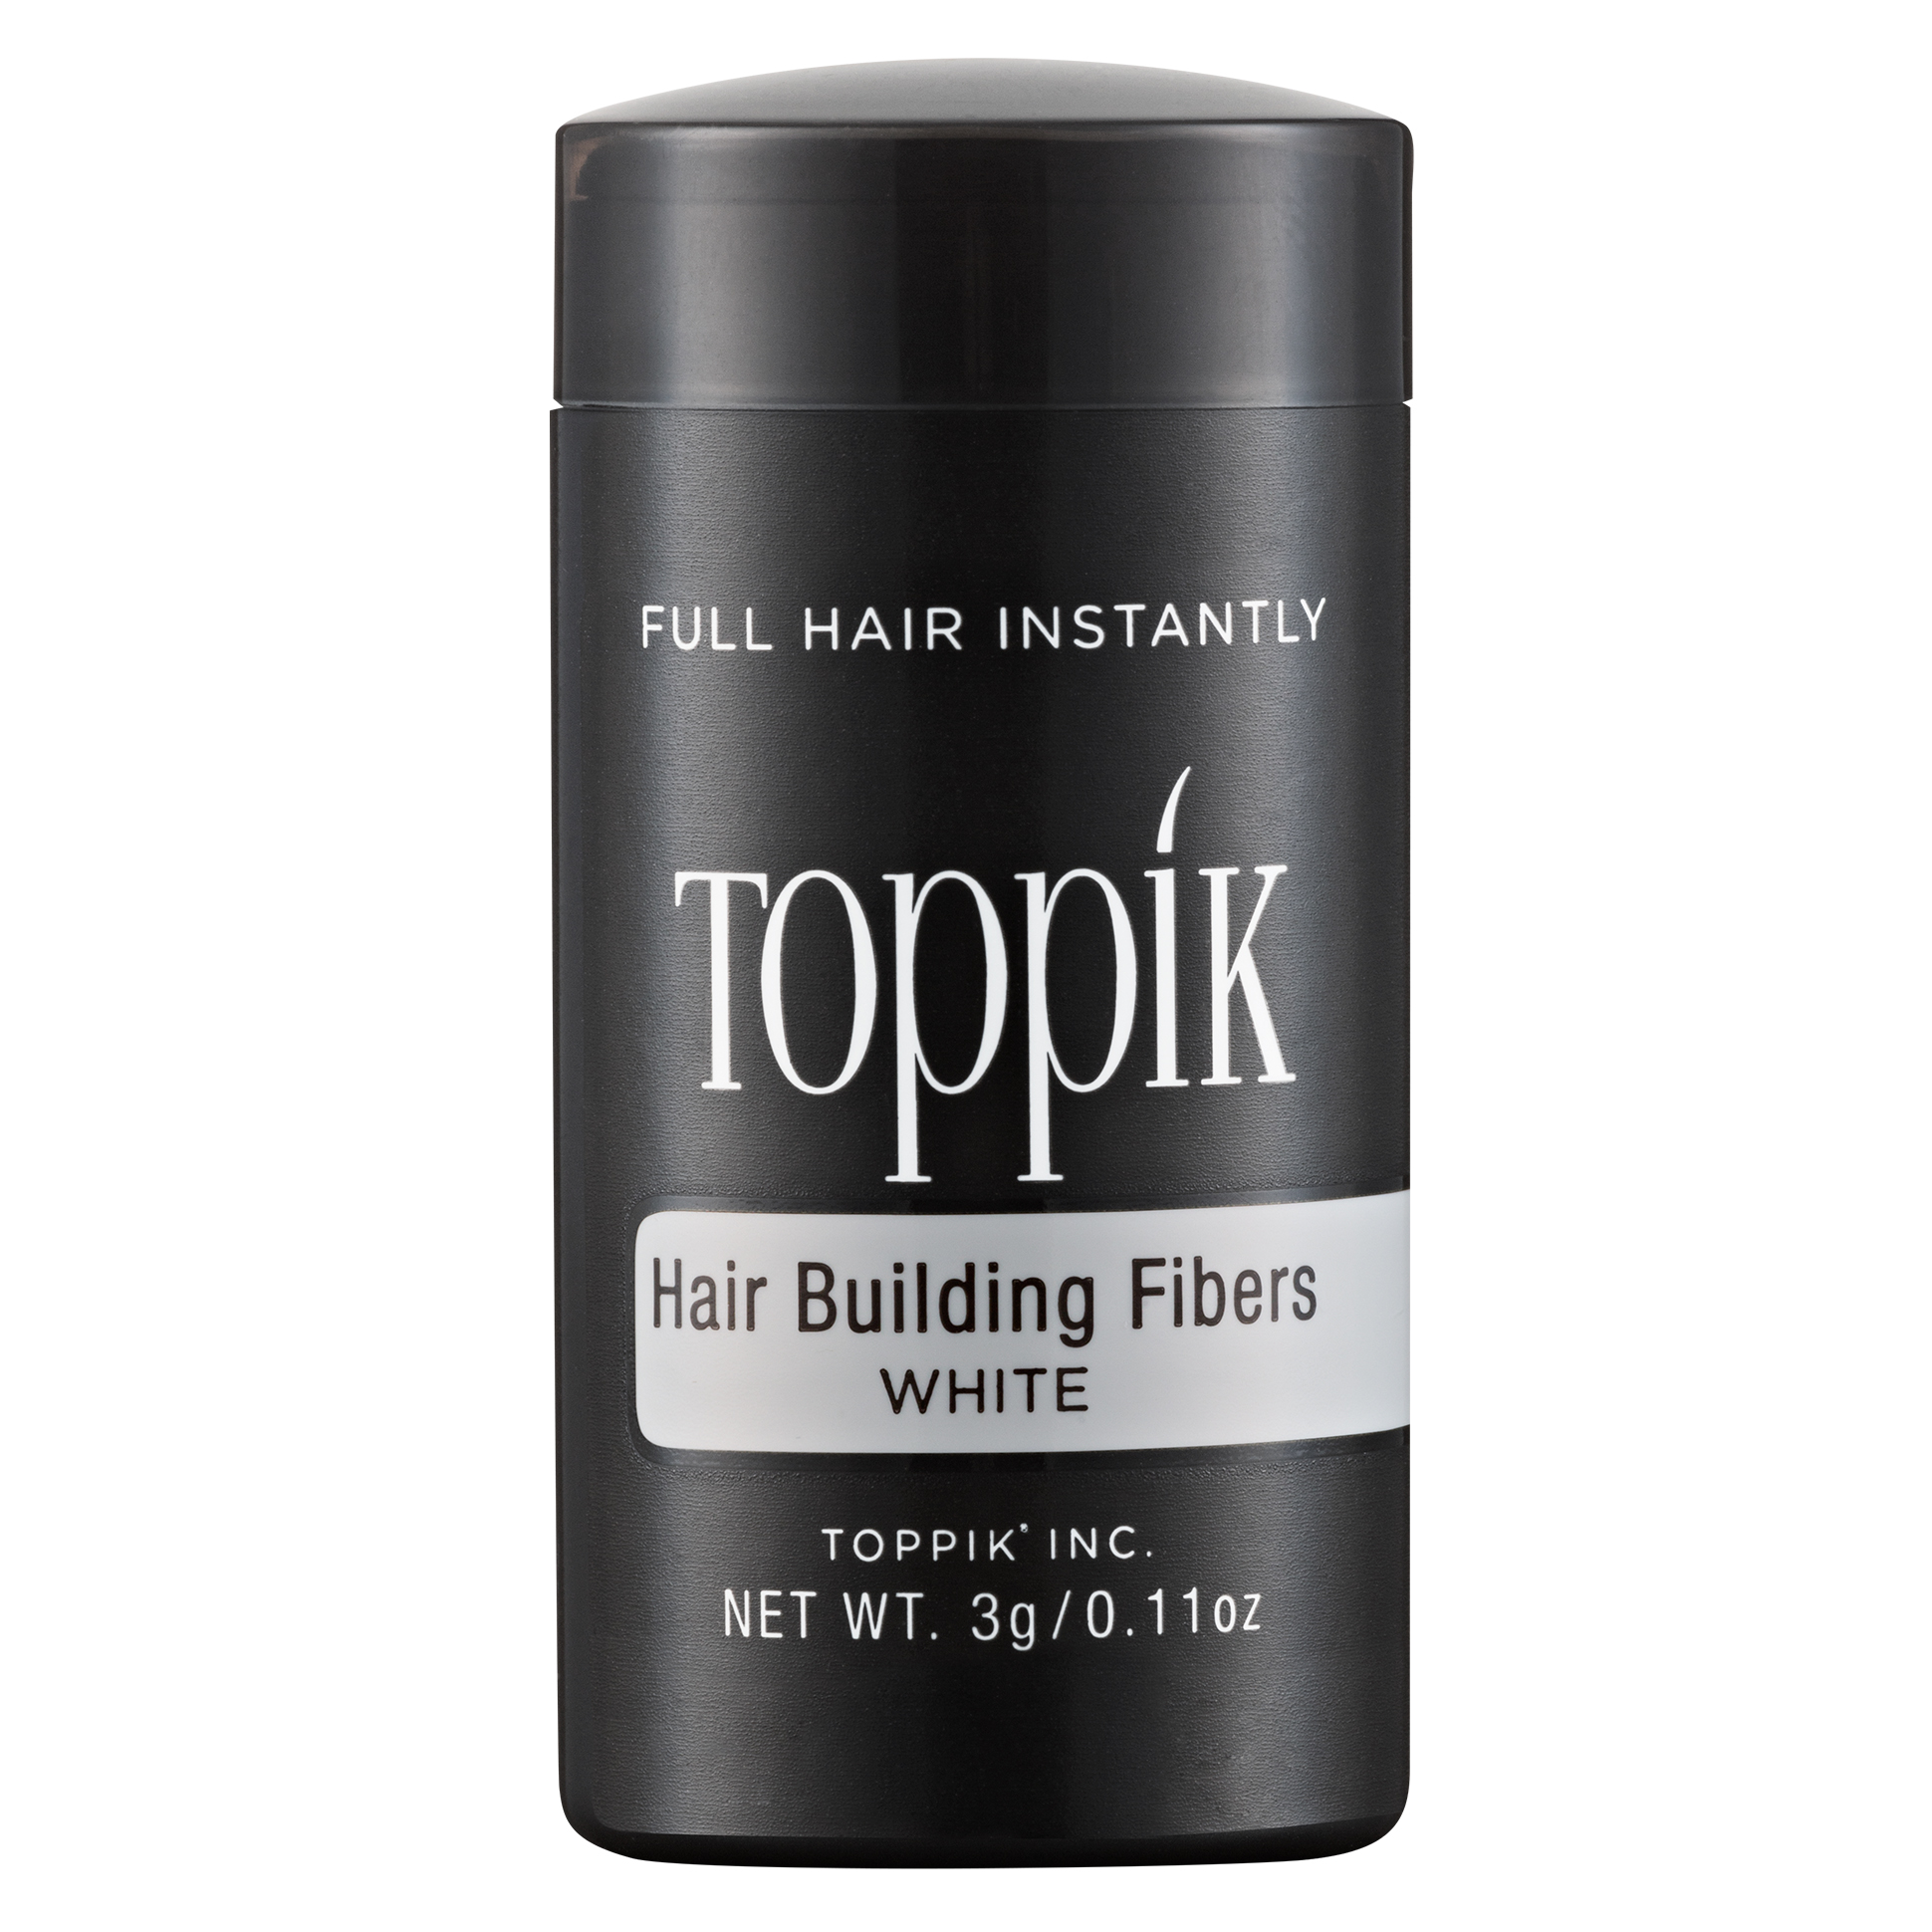 HAIR BUILDING FIBERS - TRAVEL SIZE - WHITE